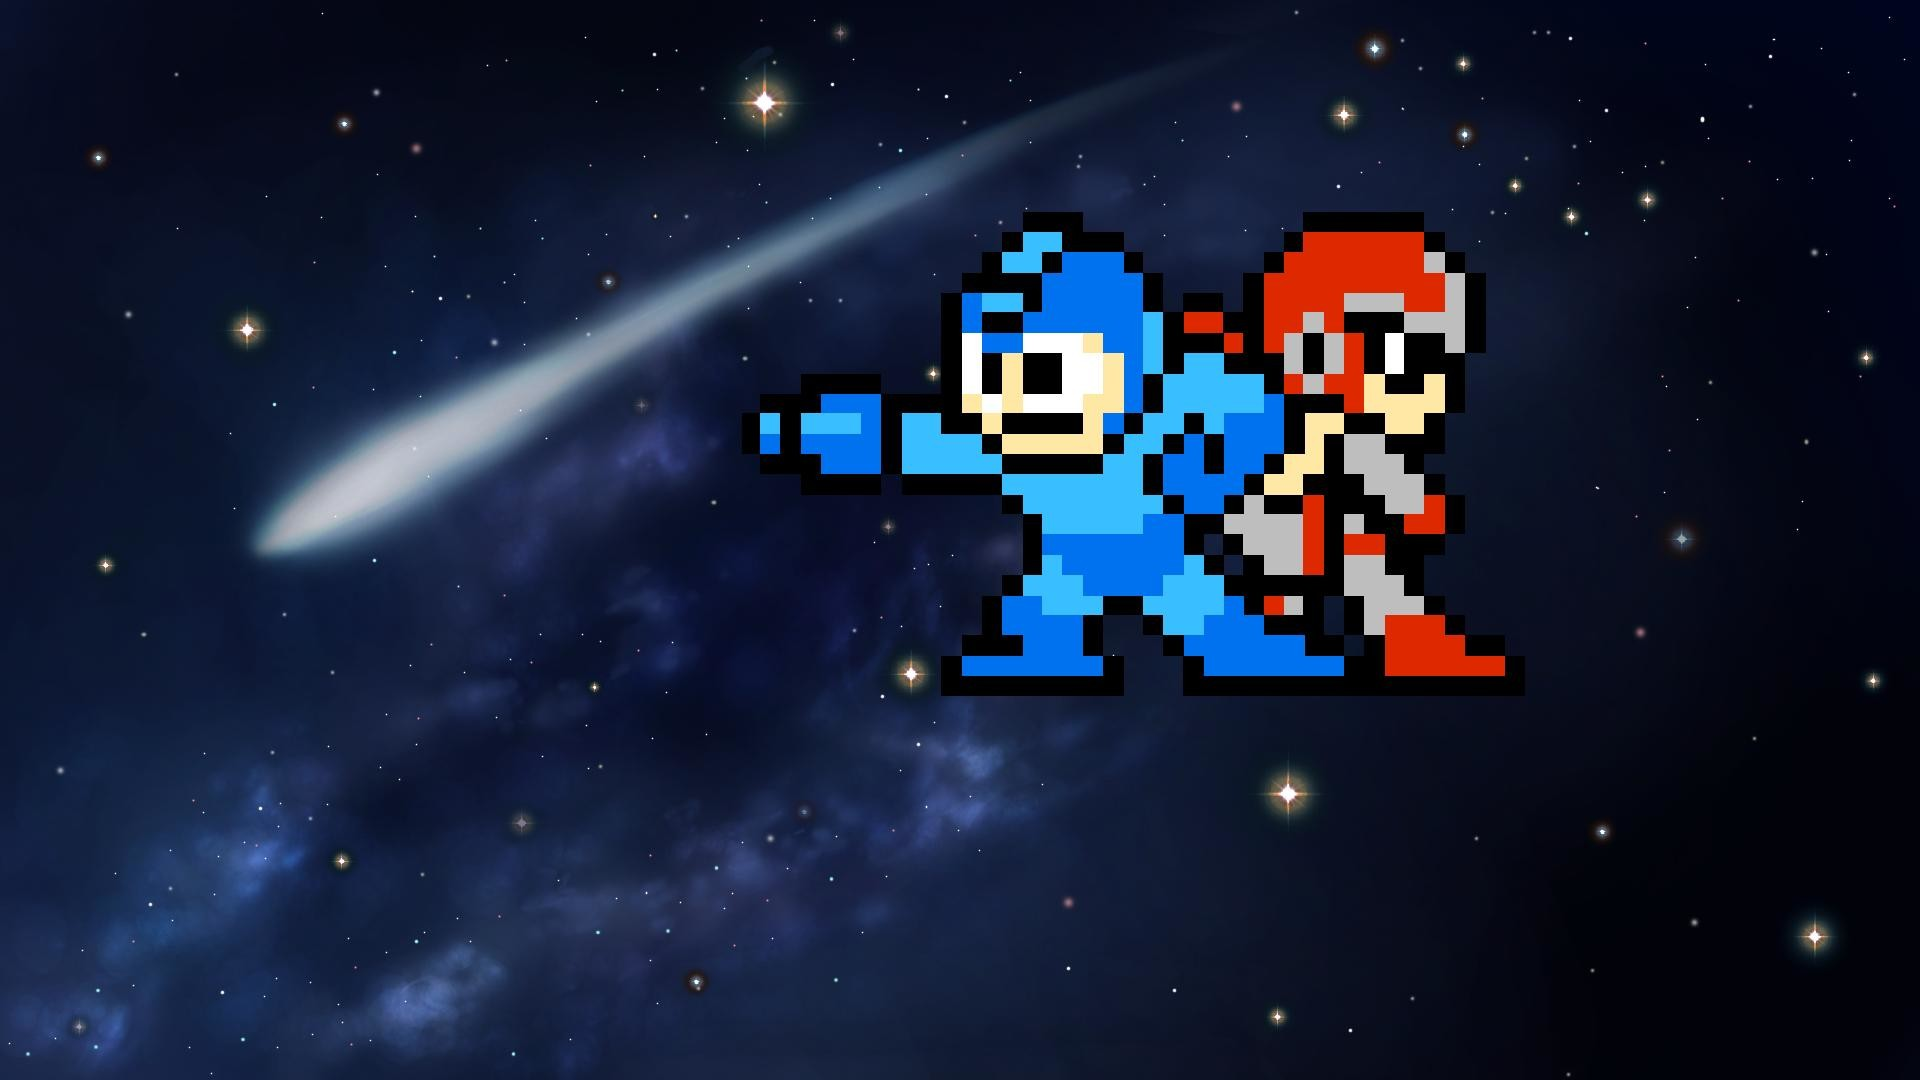 Images For > Megaman Wallpaper 8 Bit